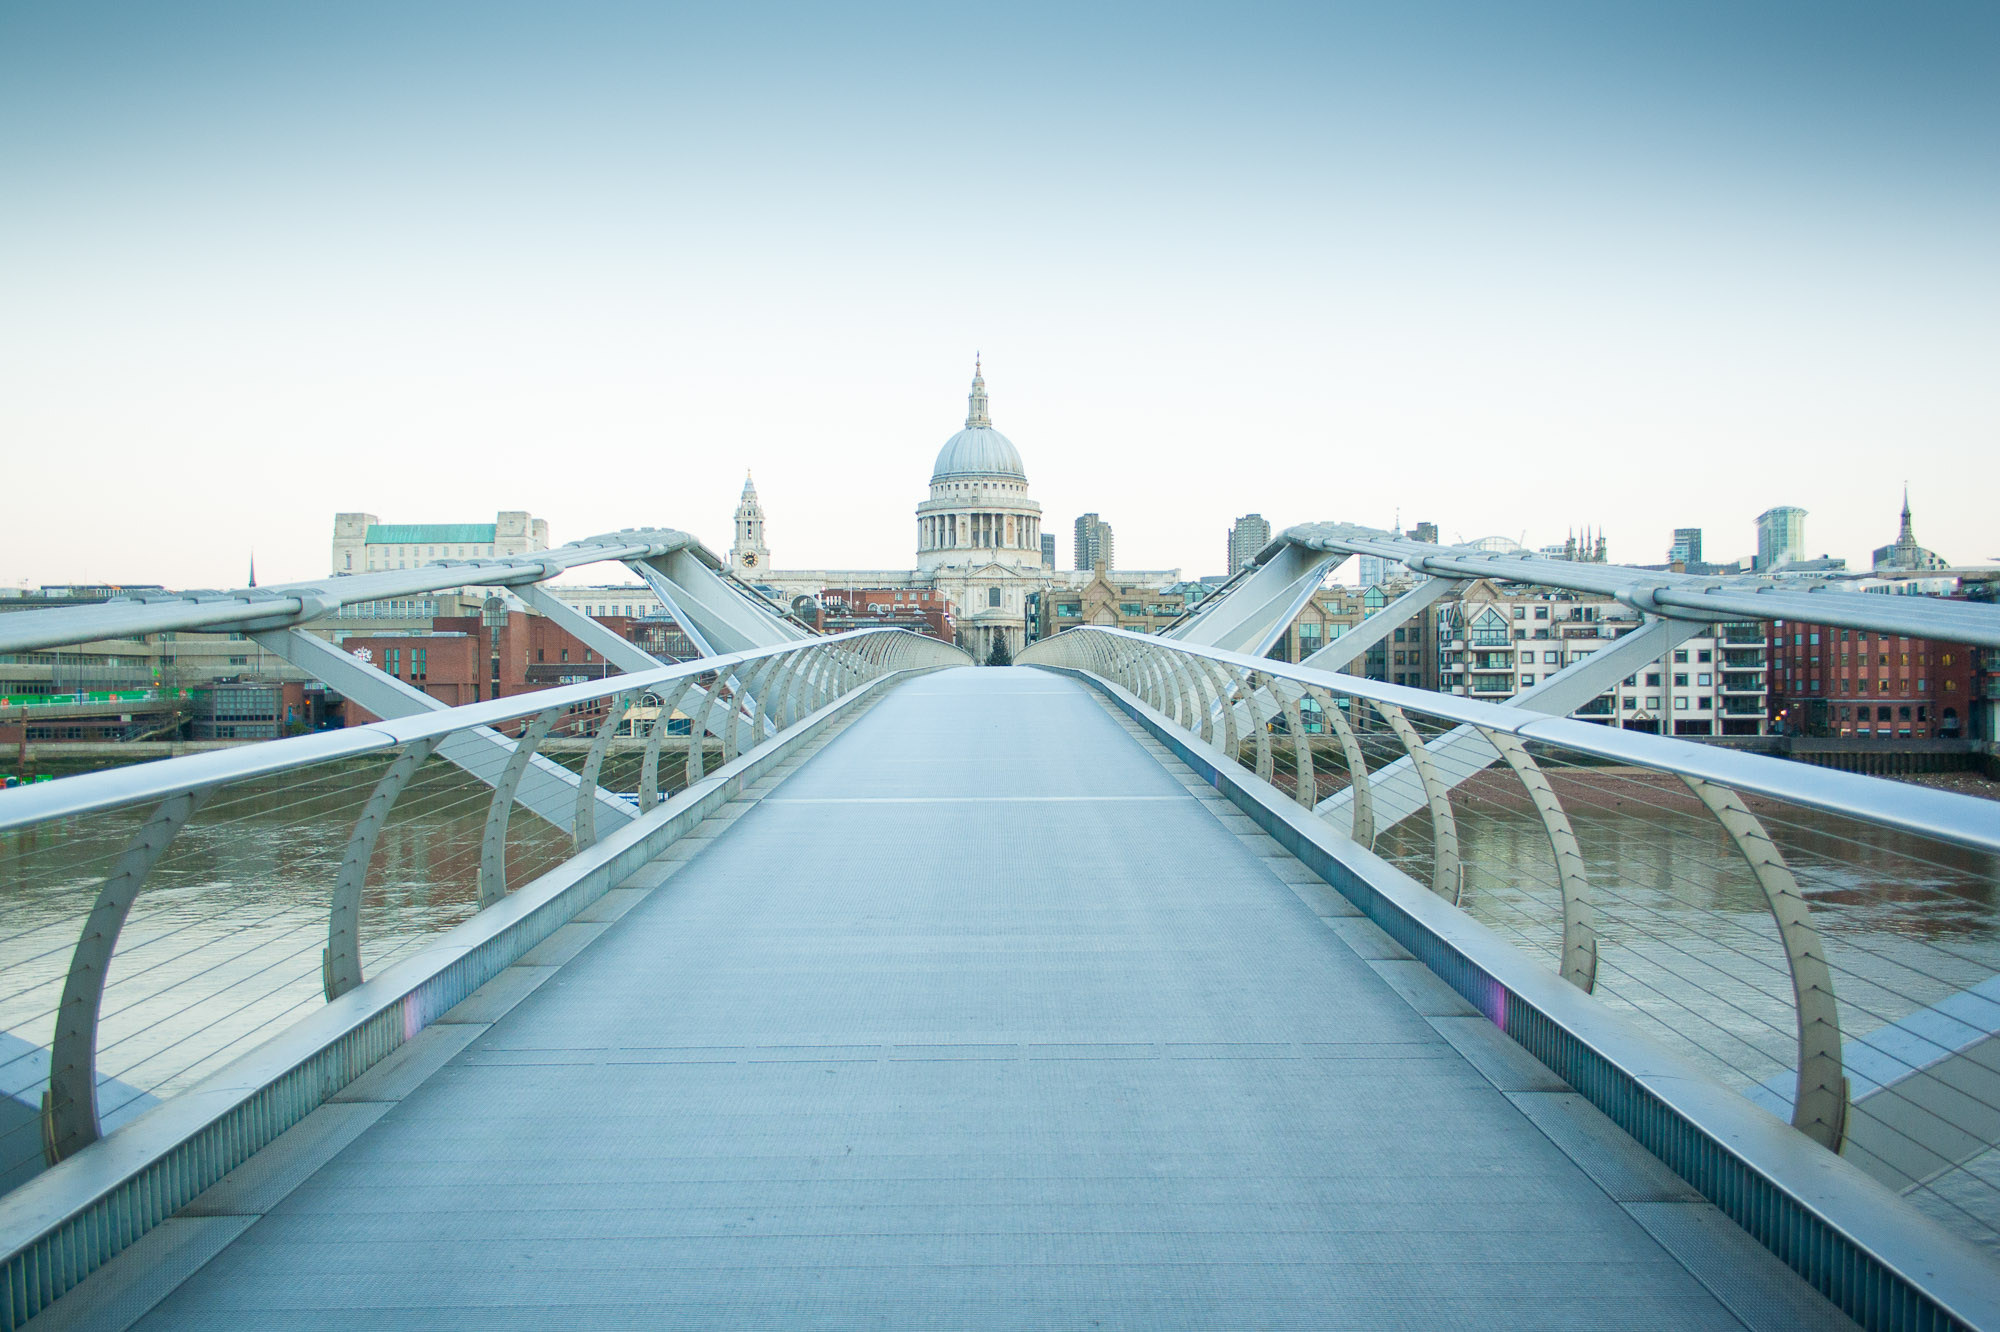 Empty streets of London